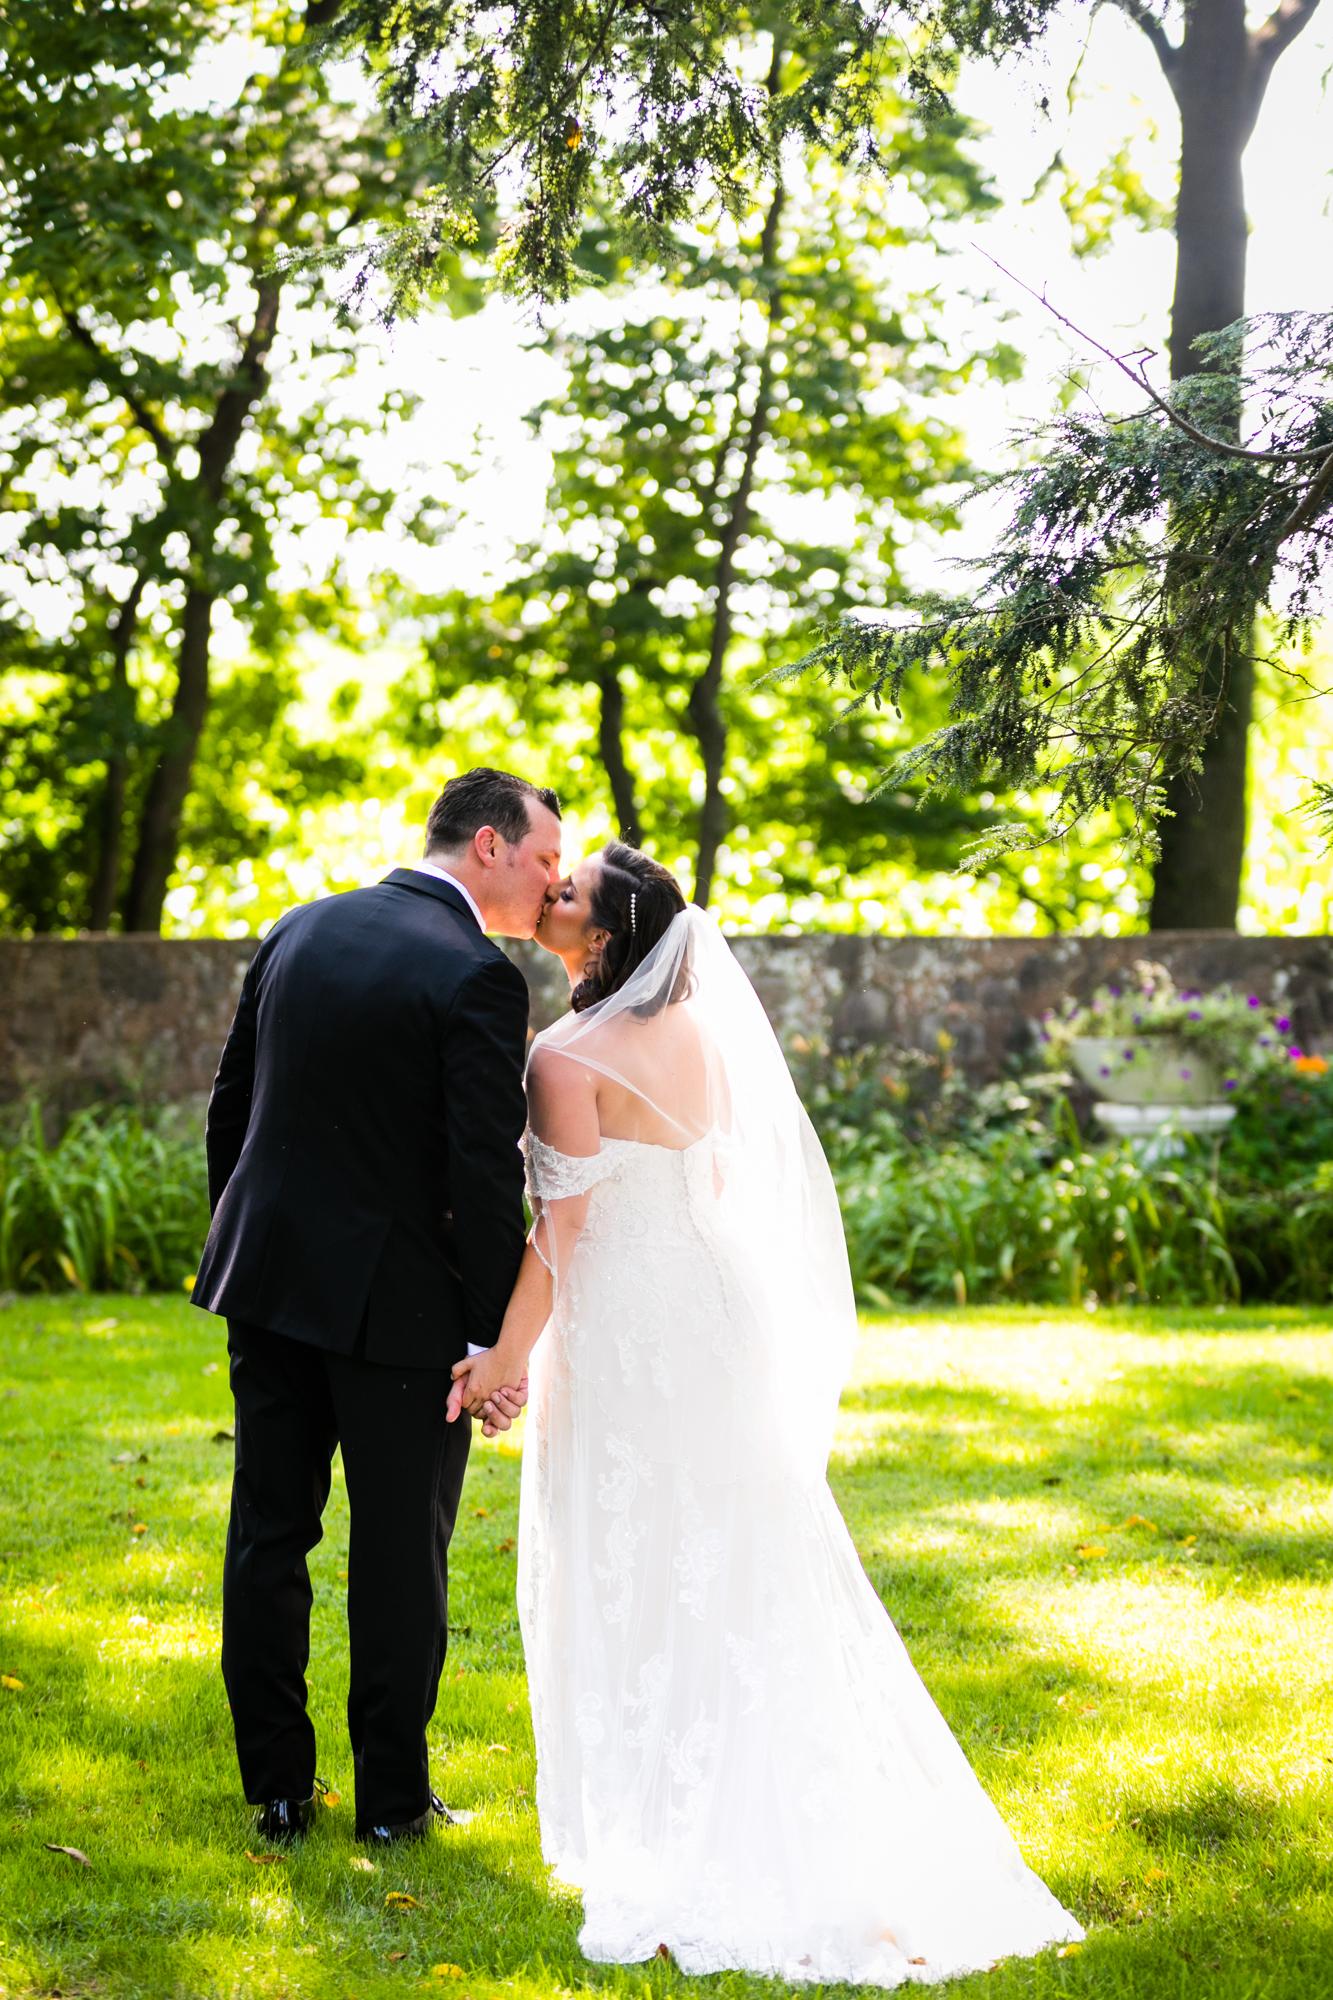 Hotel Du Village - LoveStruck Pictures - Wedding Photography-028.jpg